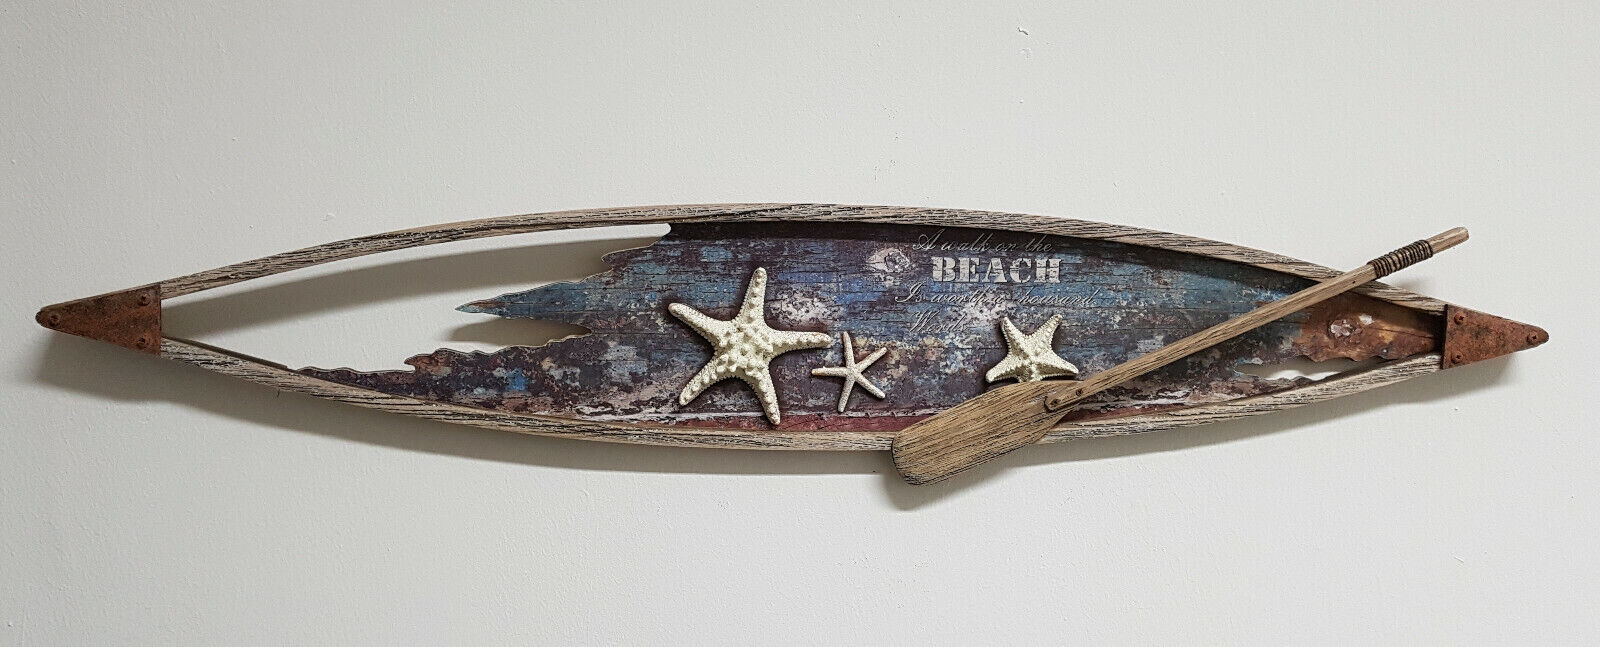 Maritimes Wandbild Wanddekoration Stiefel Paddel Seesterne   3D Optik  Vintage Look